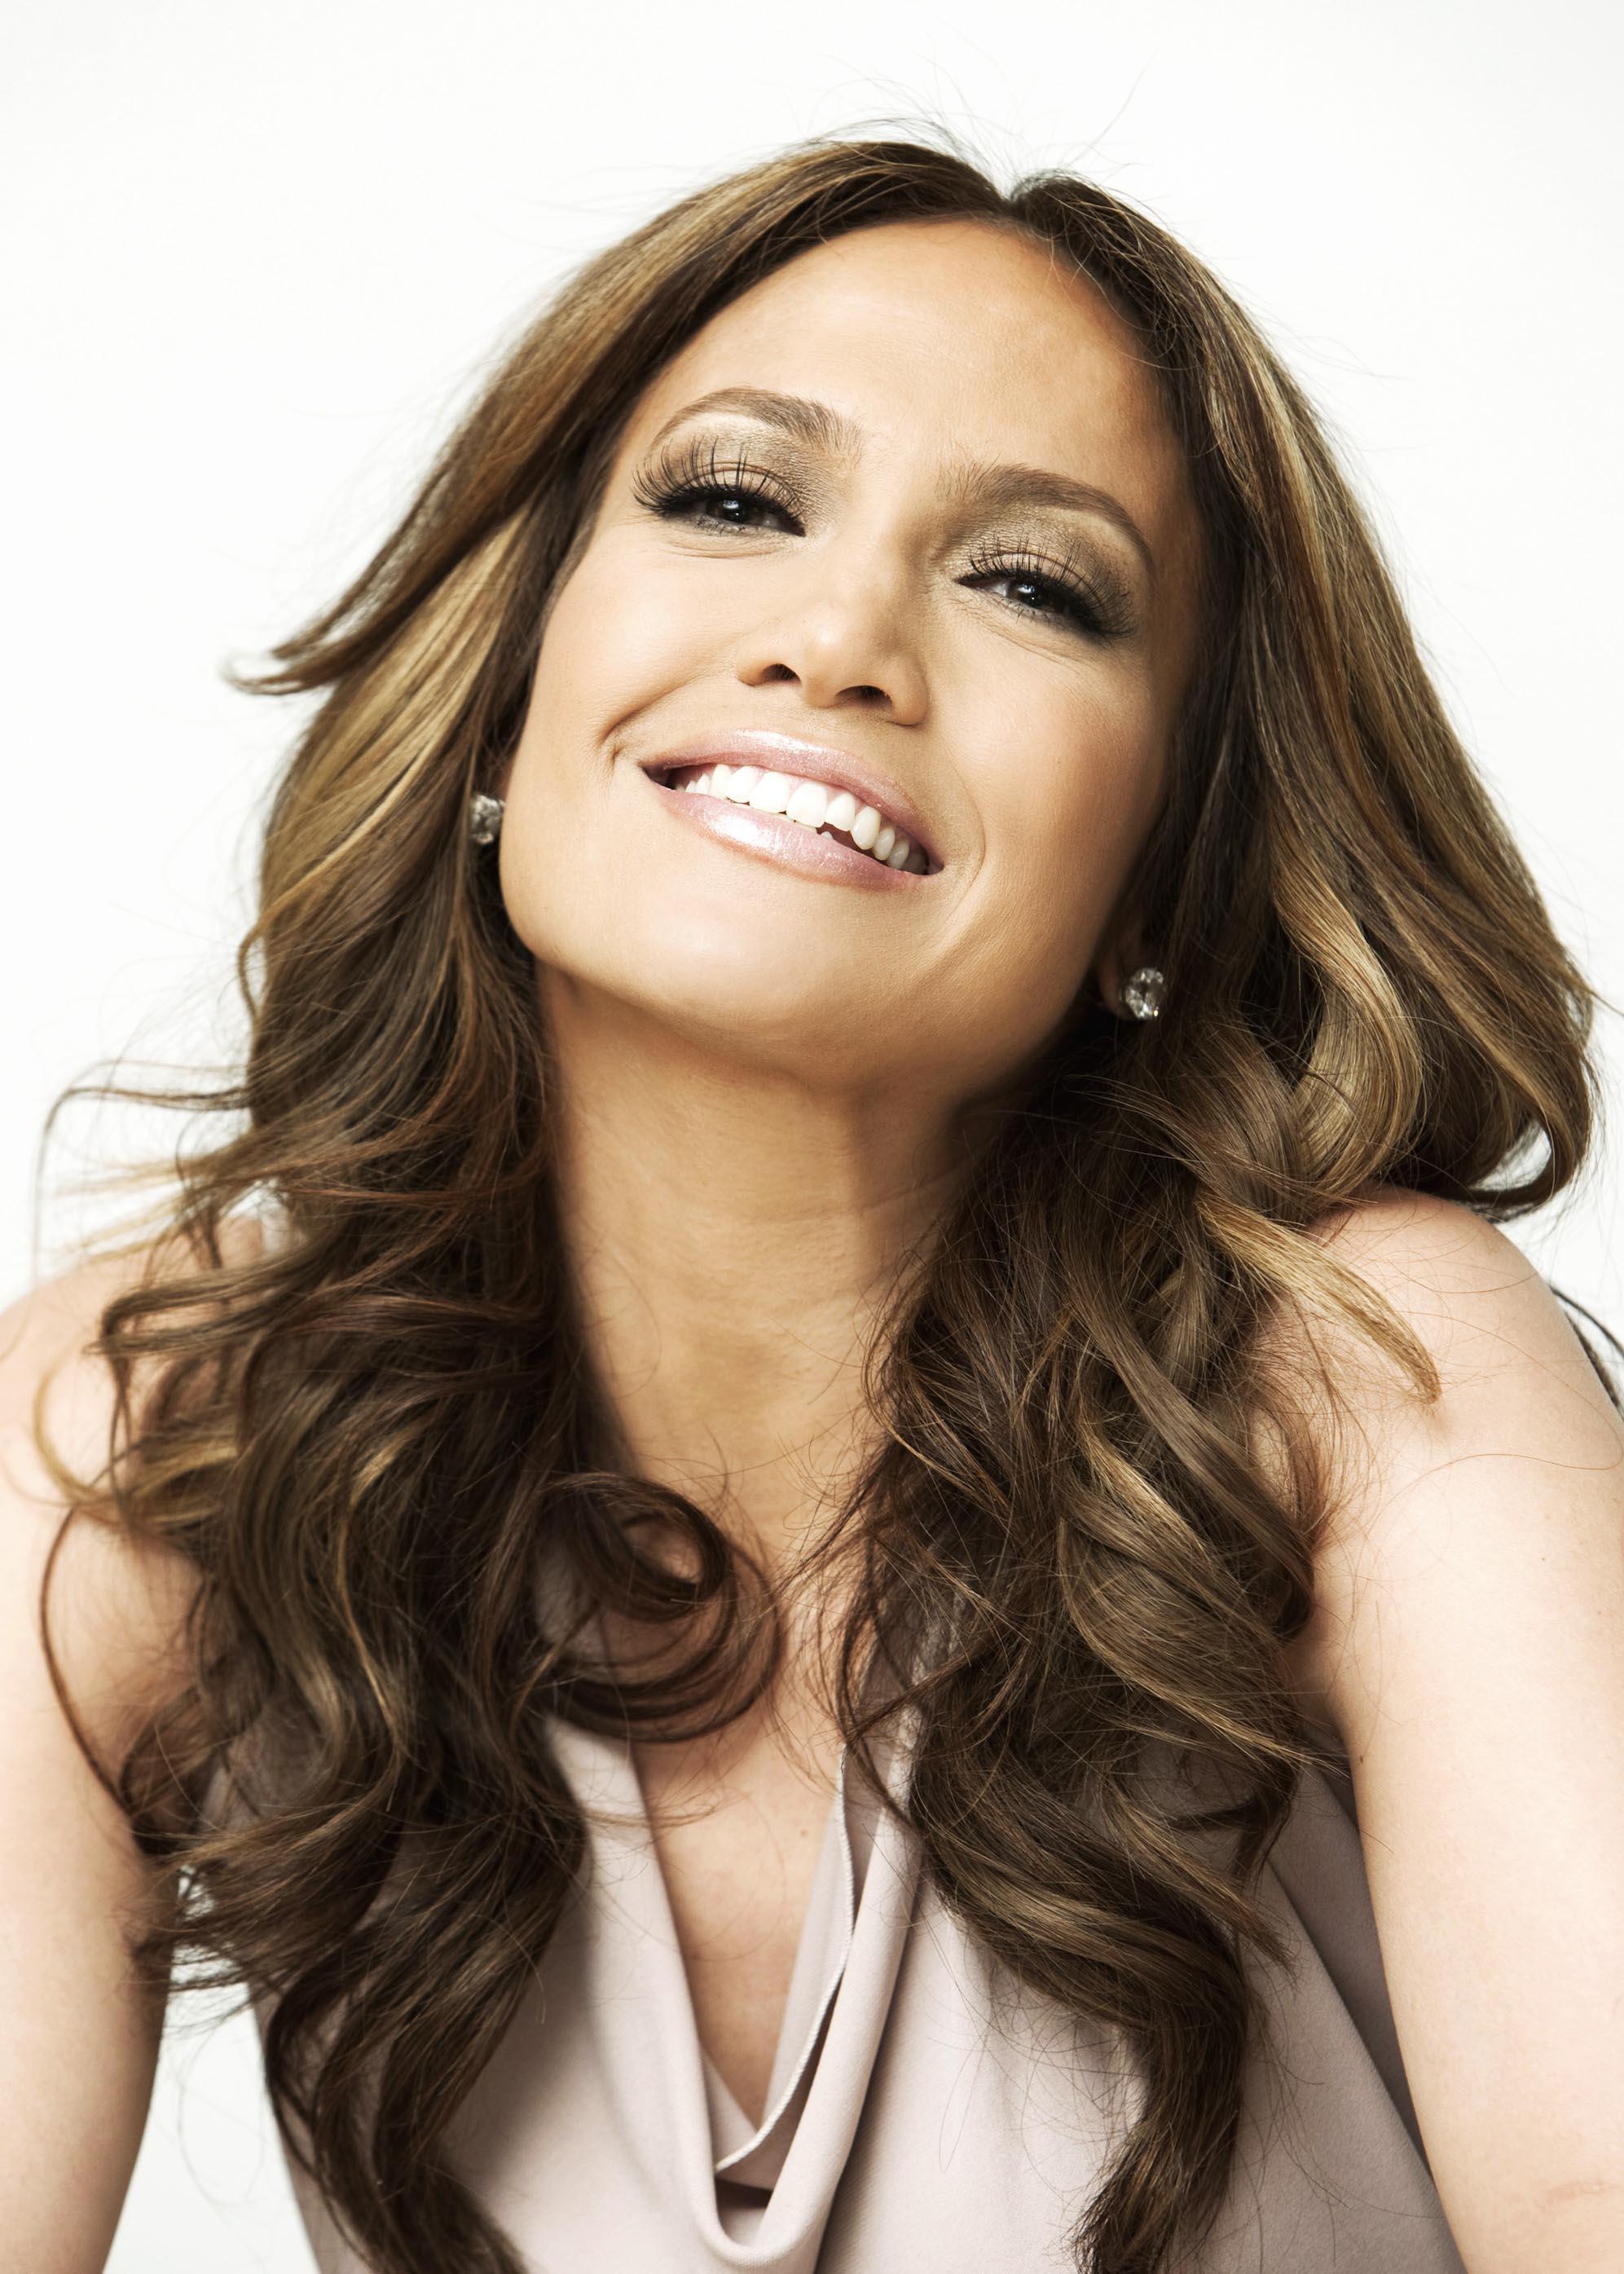 http://www.theplace.ru/archive/jennifer_lopez/img/Jennifer_Lopez_4.jpg